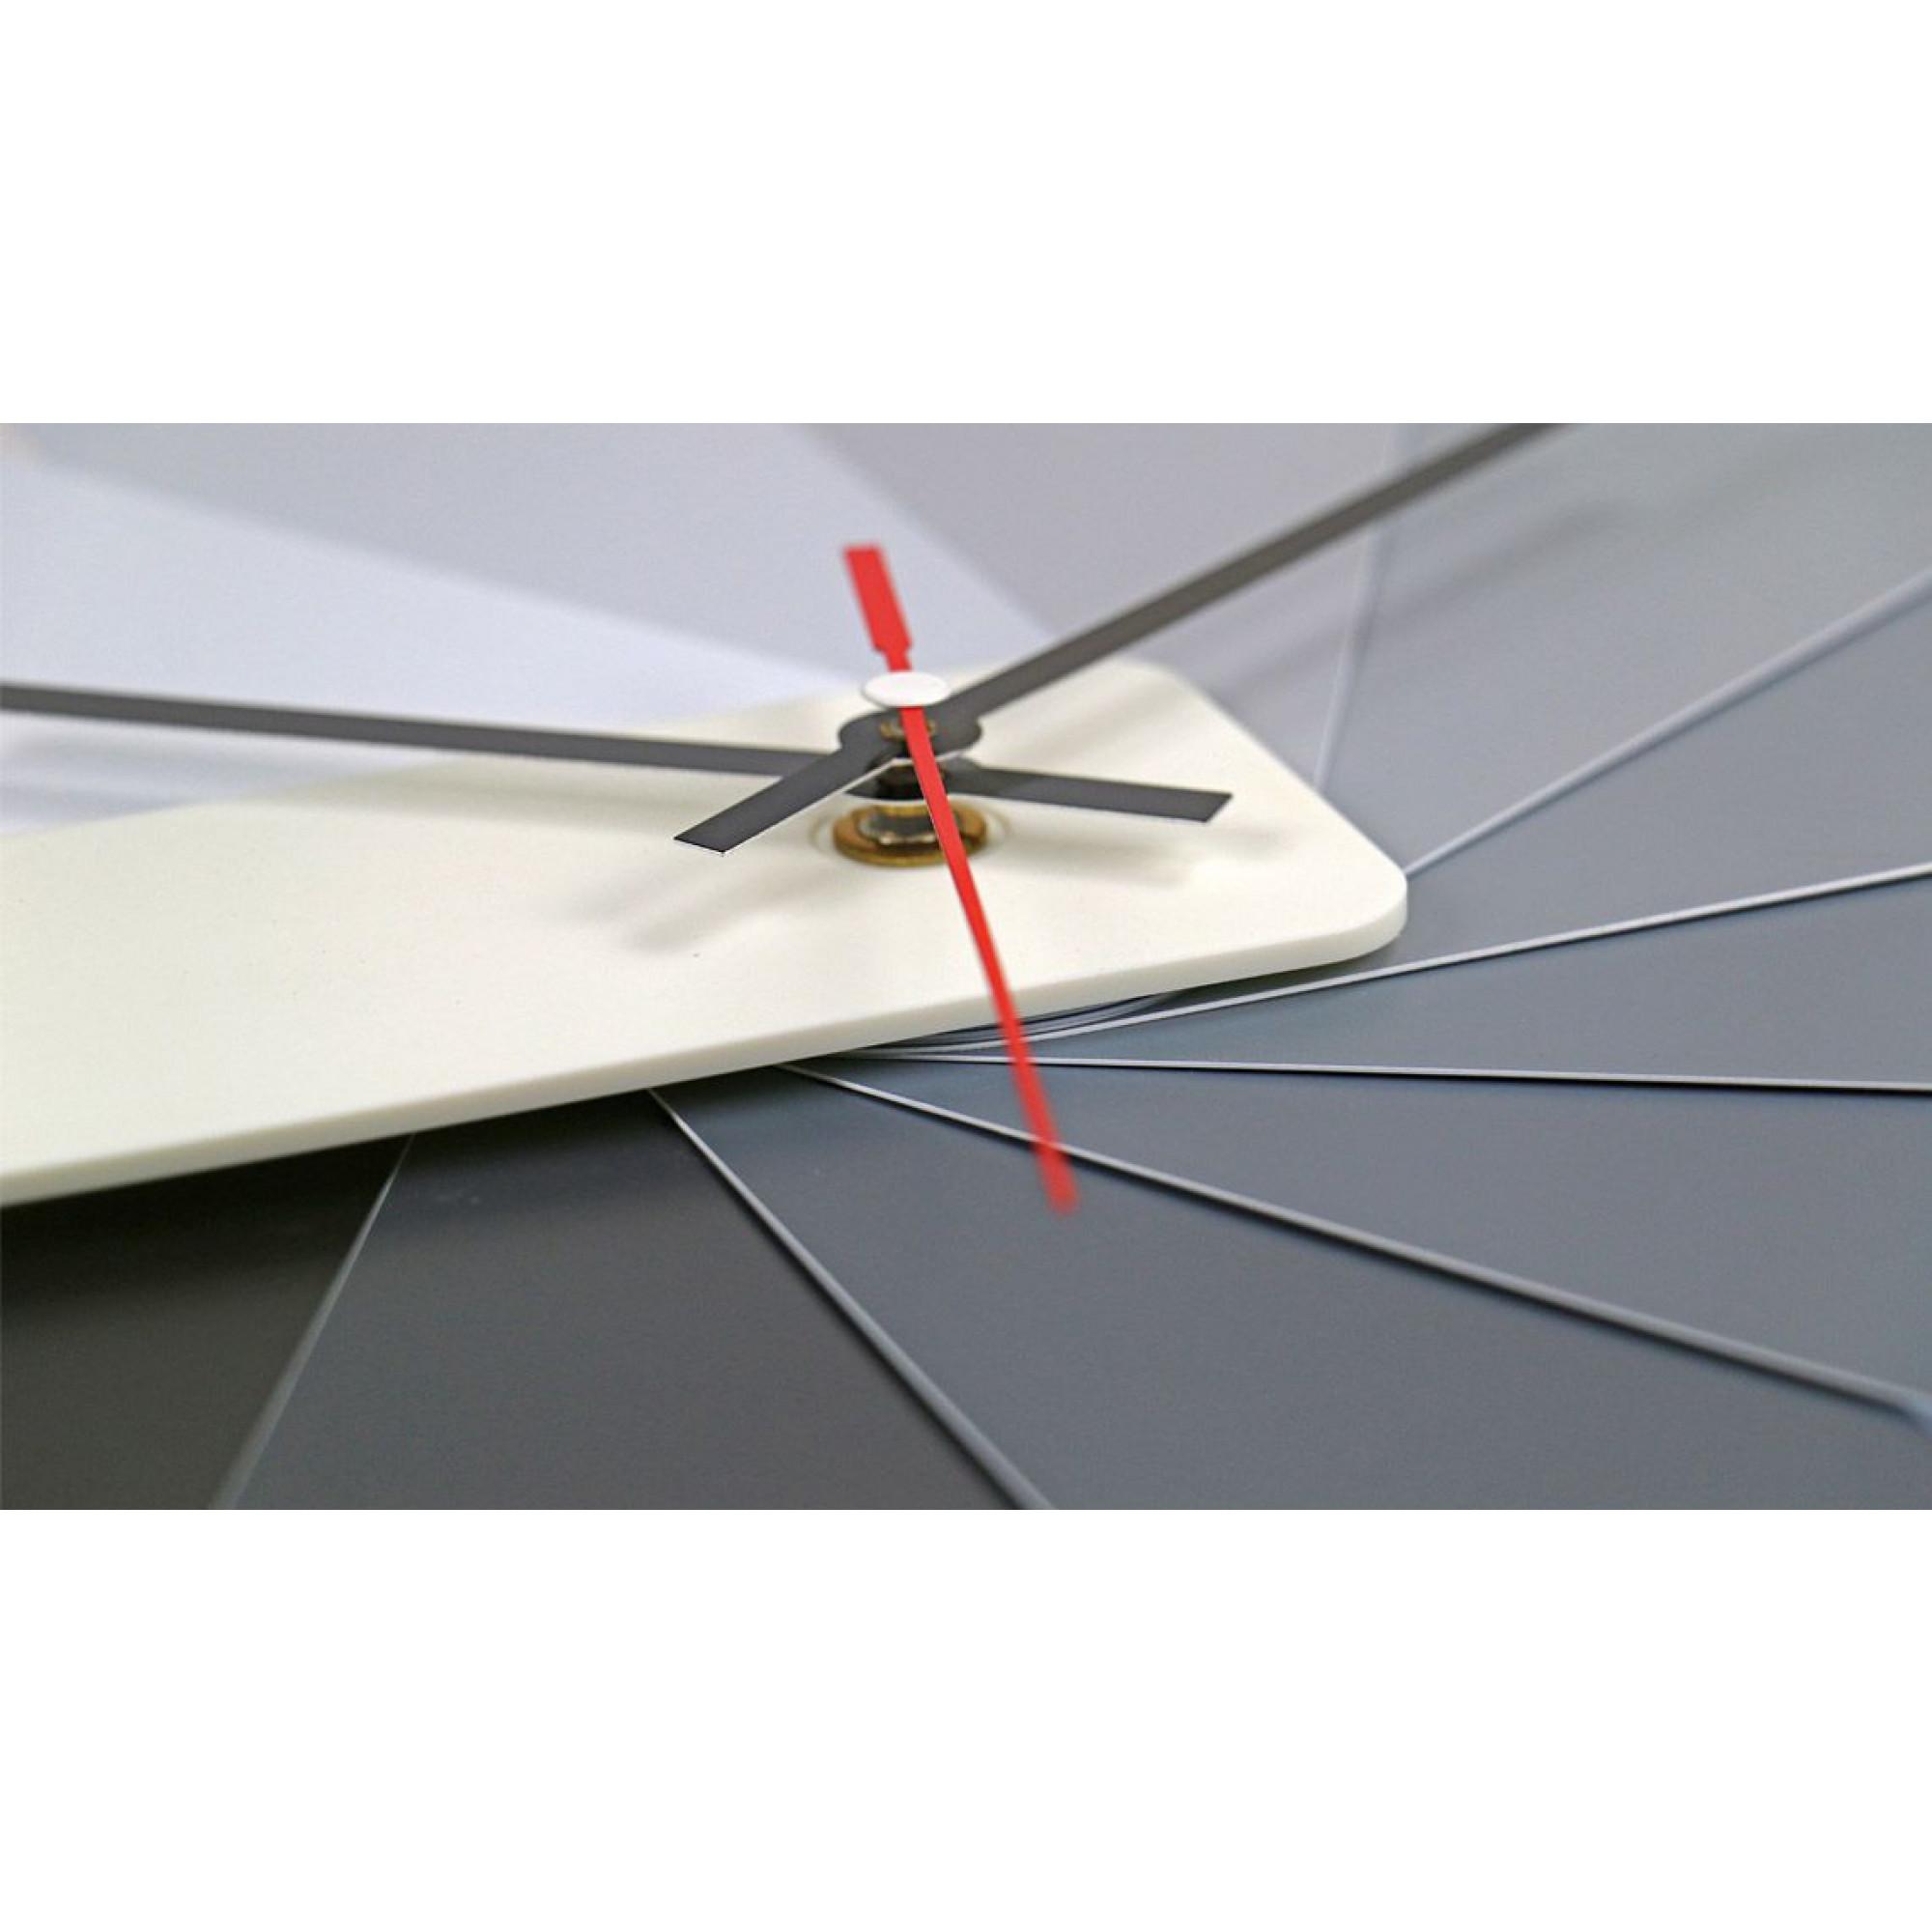 Desk/Wall Foldable Analog Clock Transformer   White & Monochrome